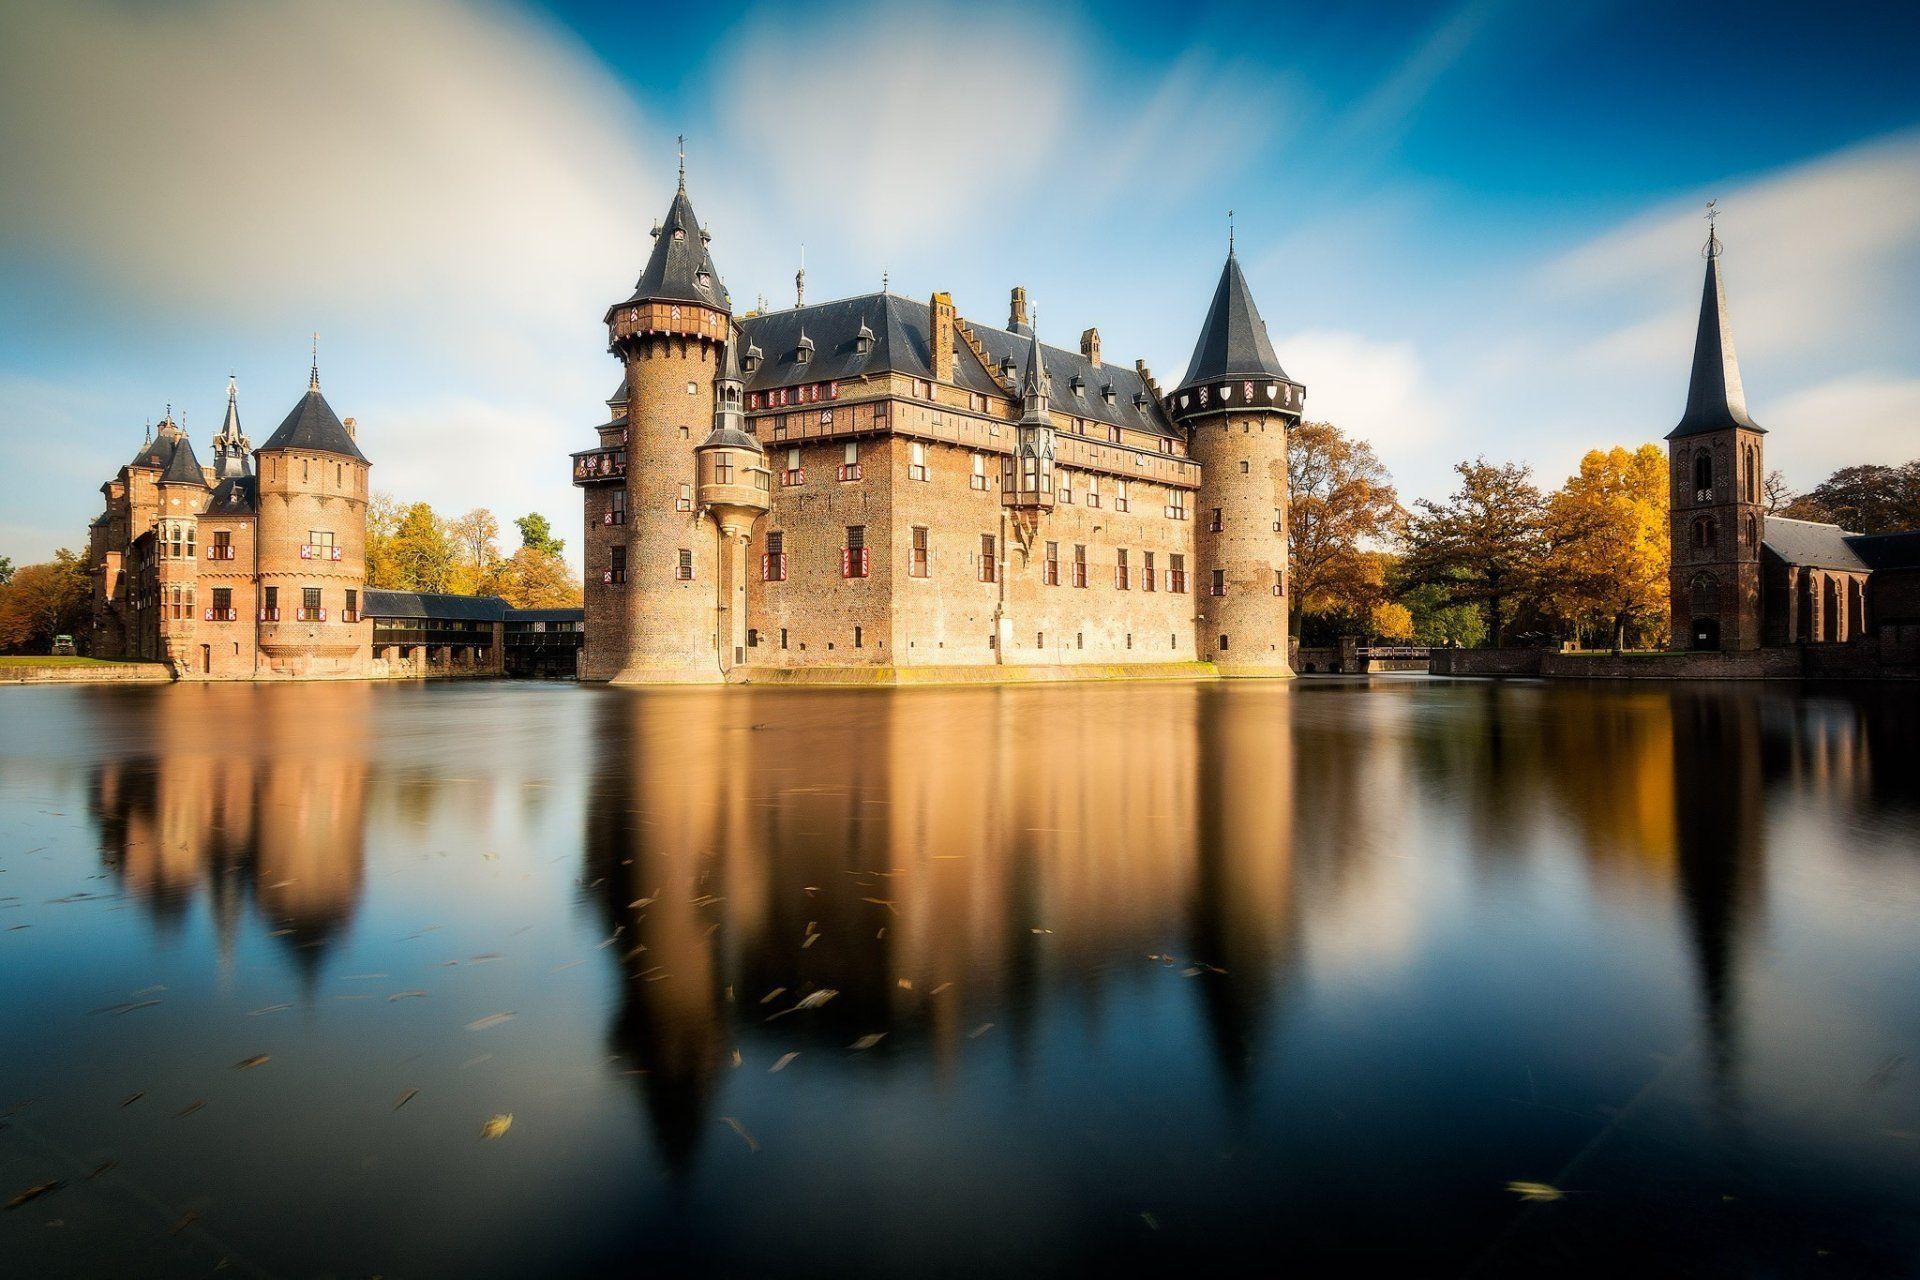 Man Made Castle De Haar Castle Building